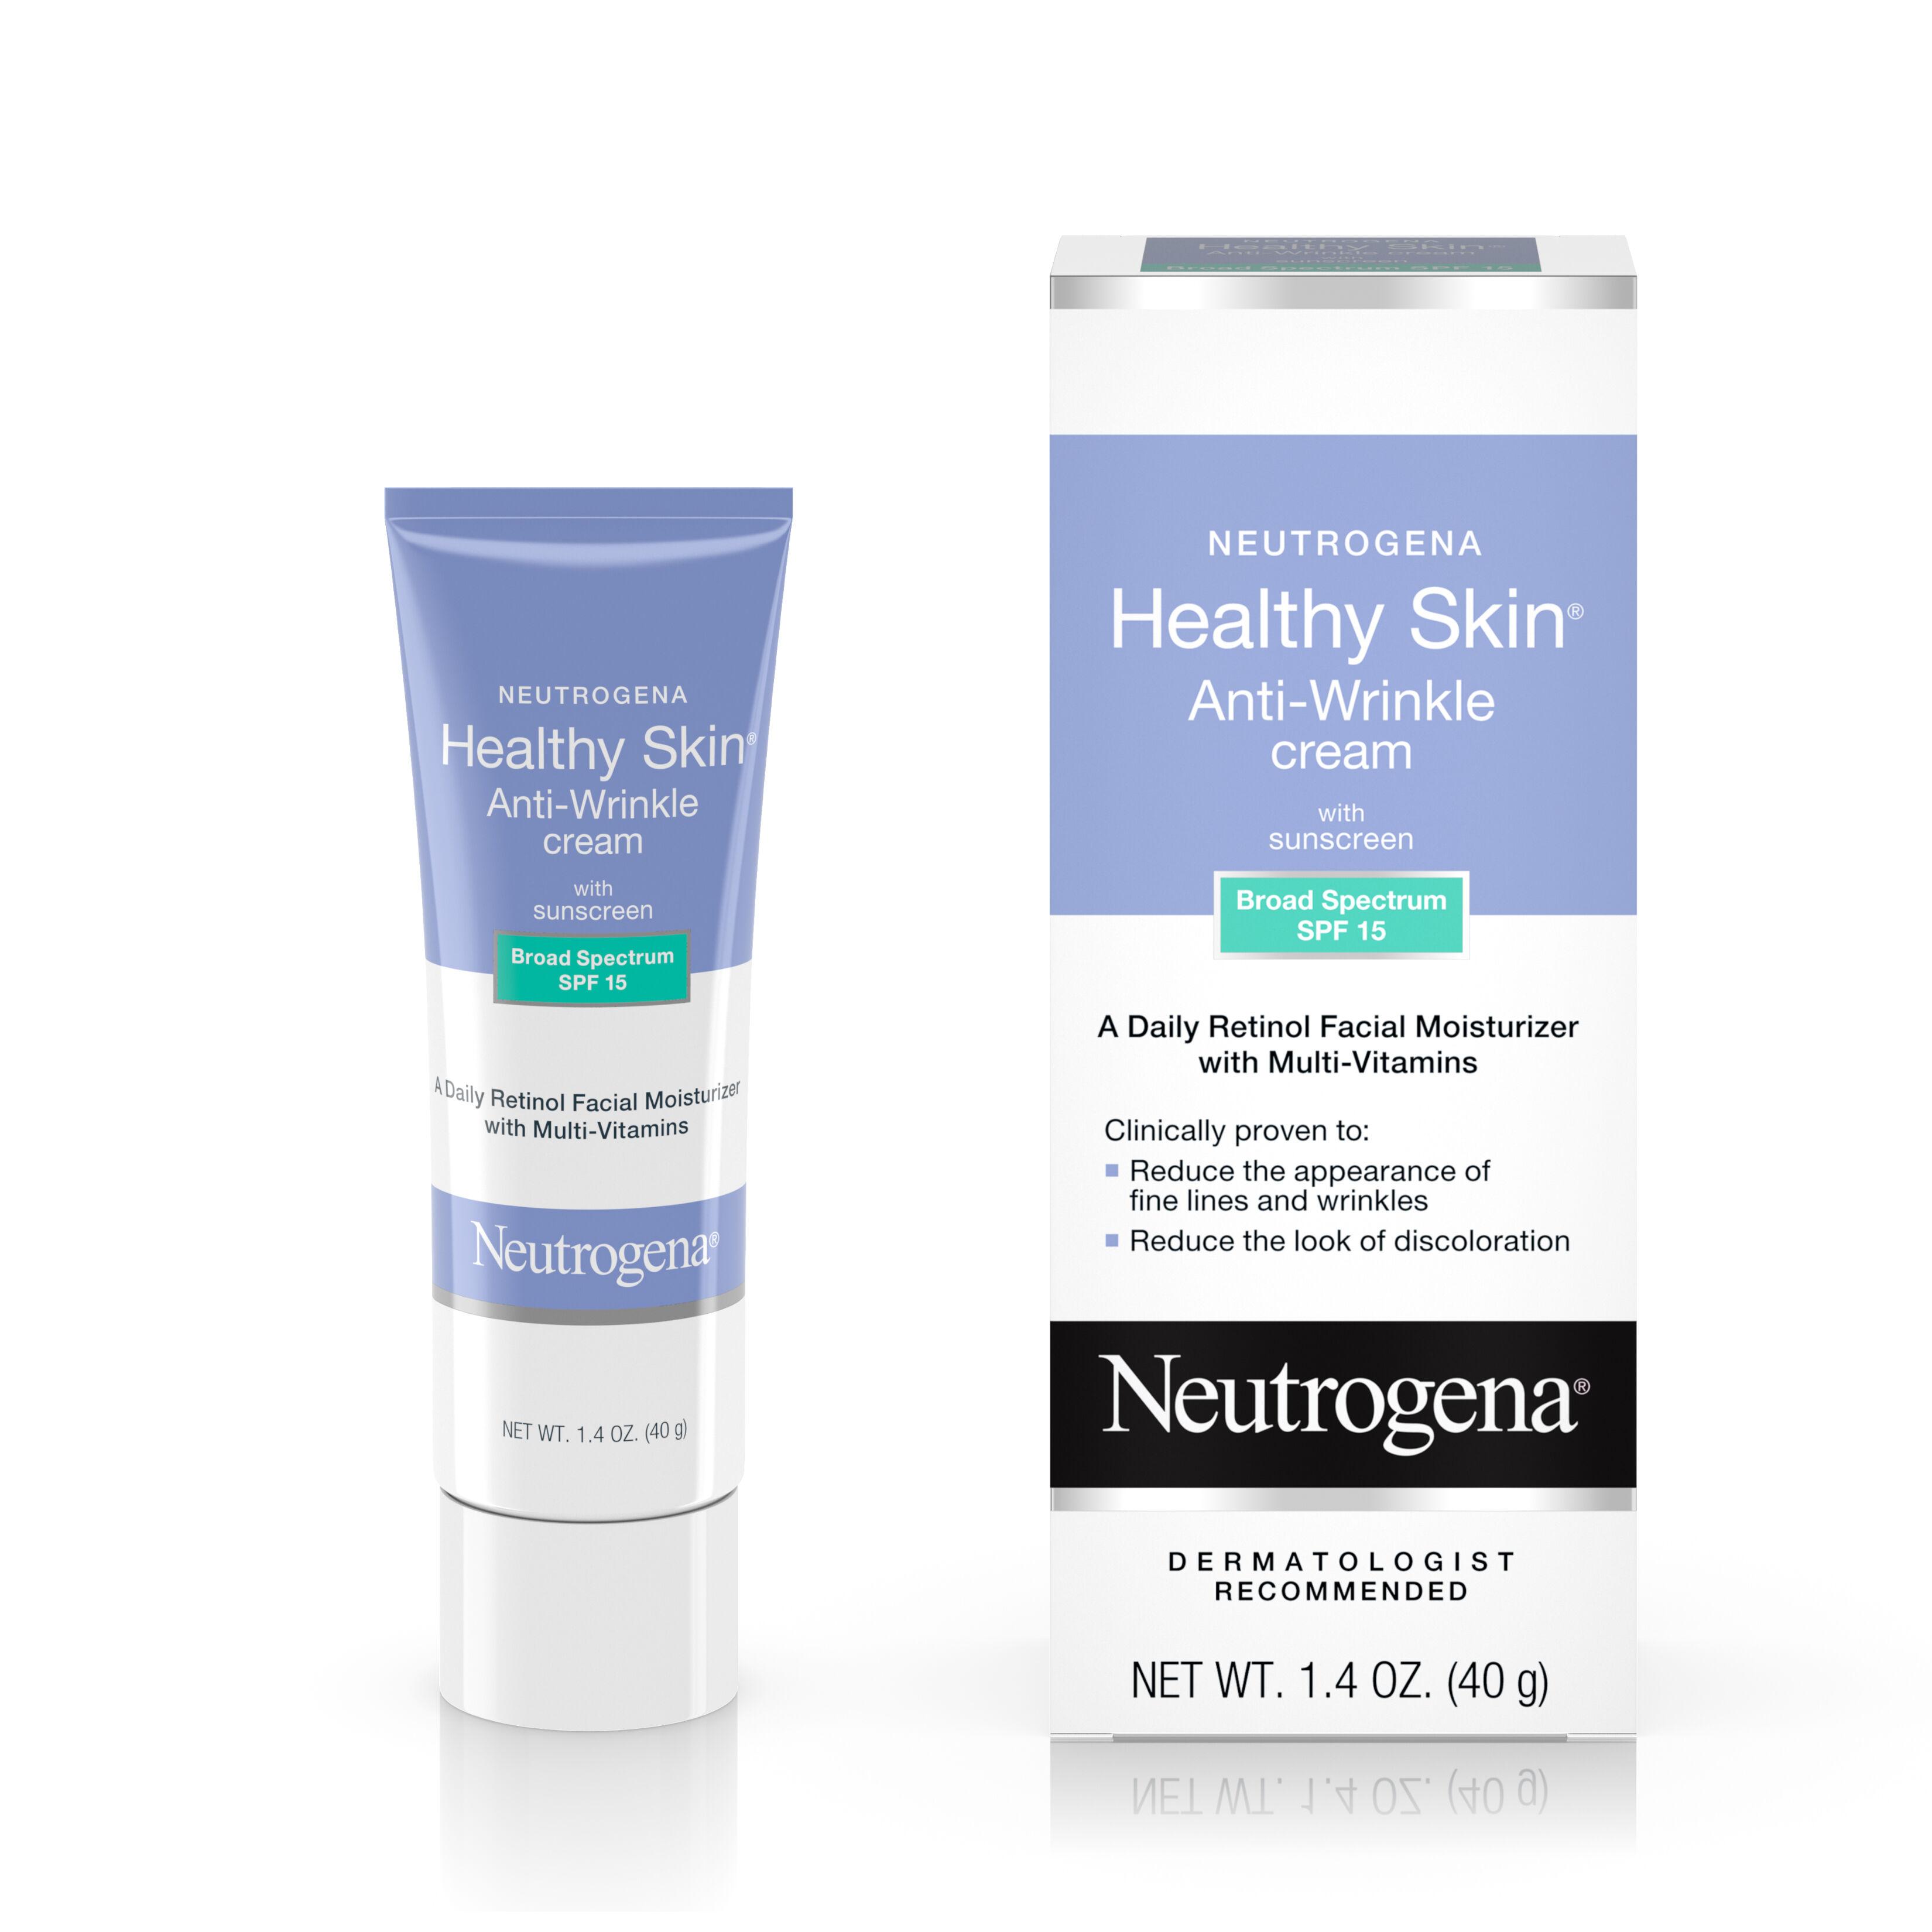 Neutrogena Healthy Skin Anti-Wrinkle With Sunscreen SPF 15 1.40 oz (Pack of 3) G.M. Collin Derm Renewal Cream 10%AHA 1.6 oz